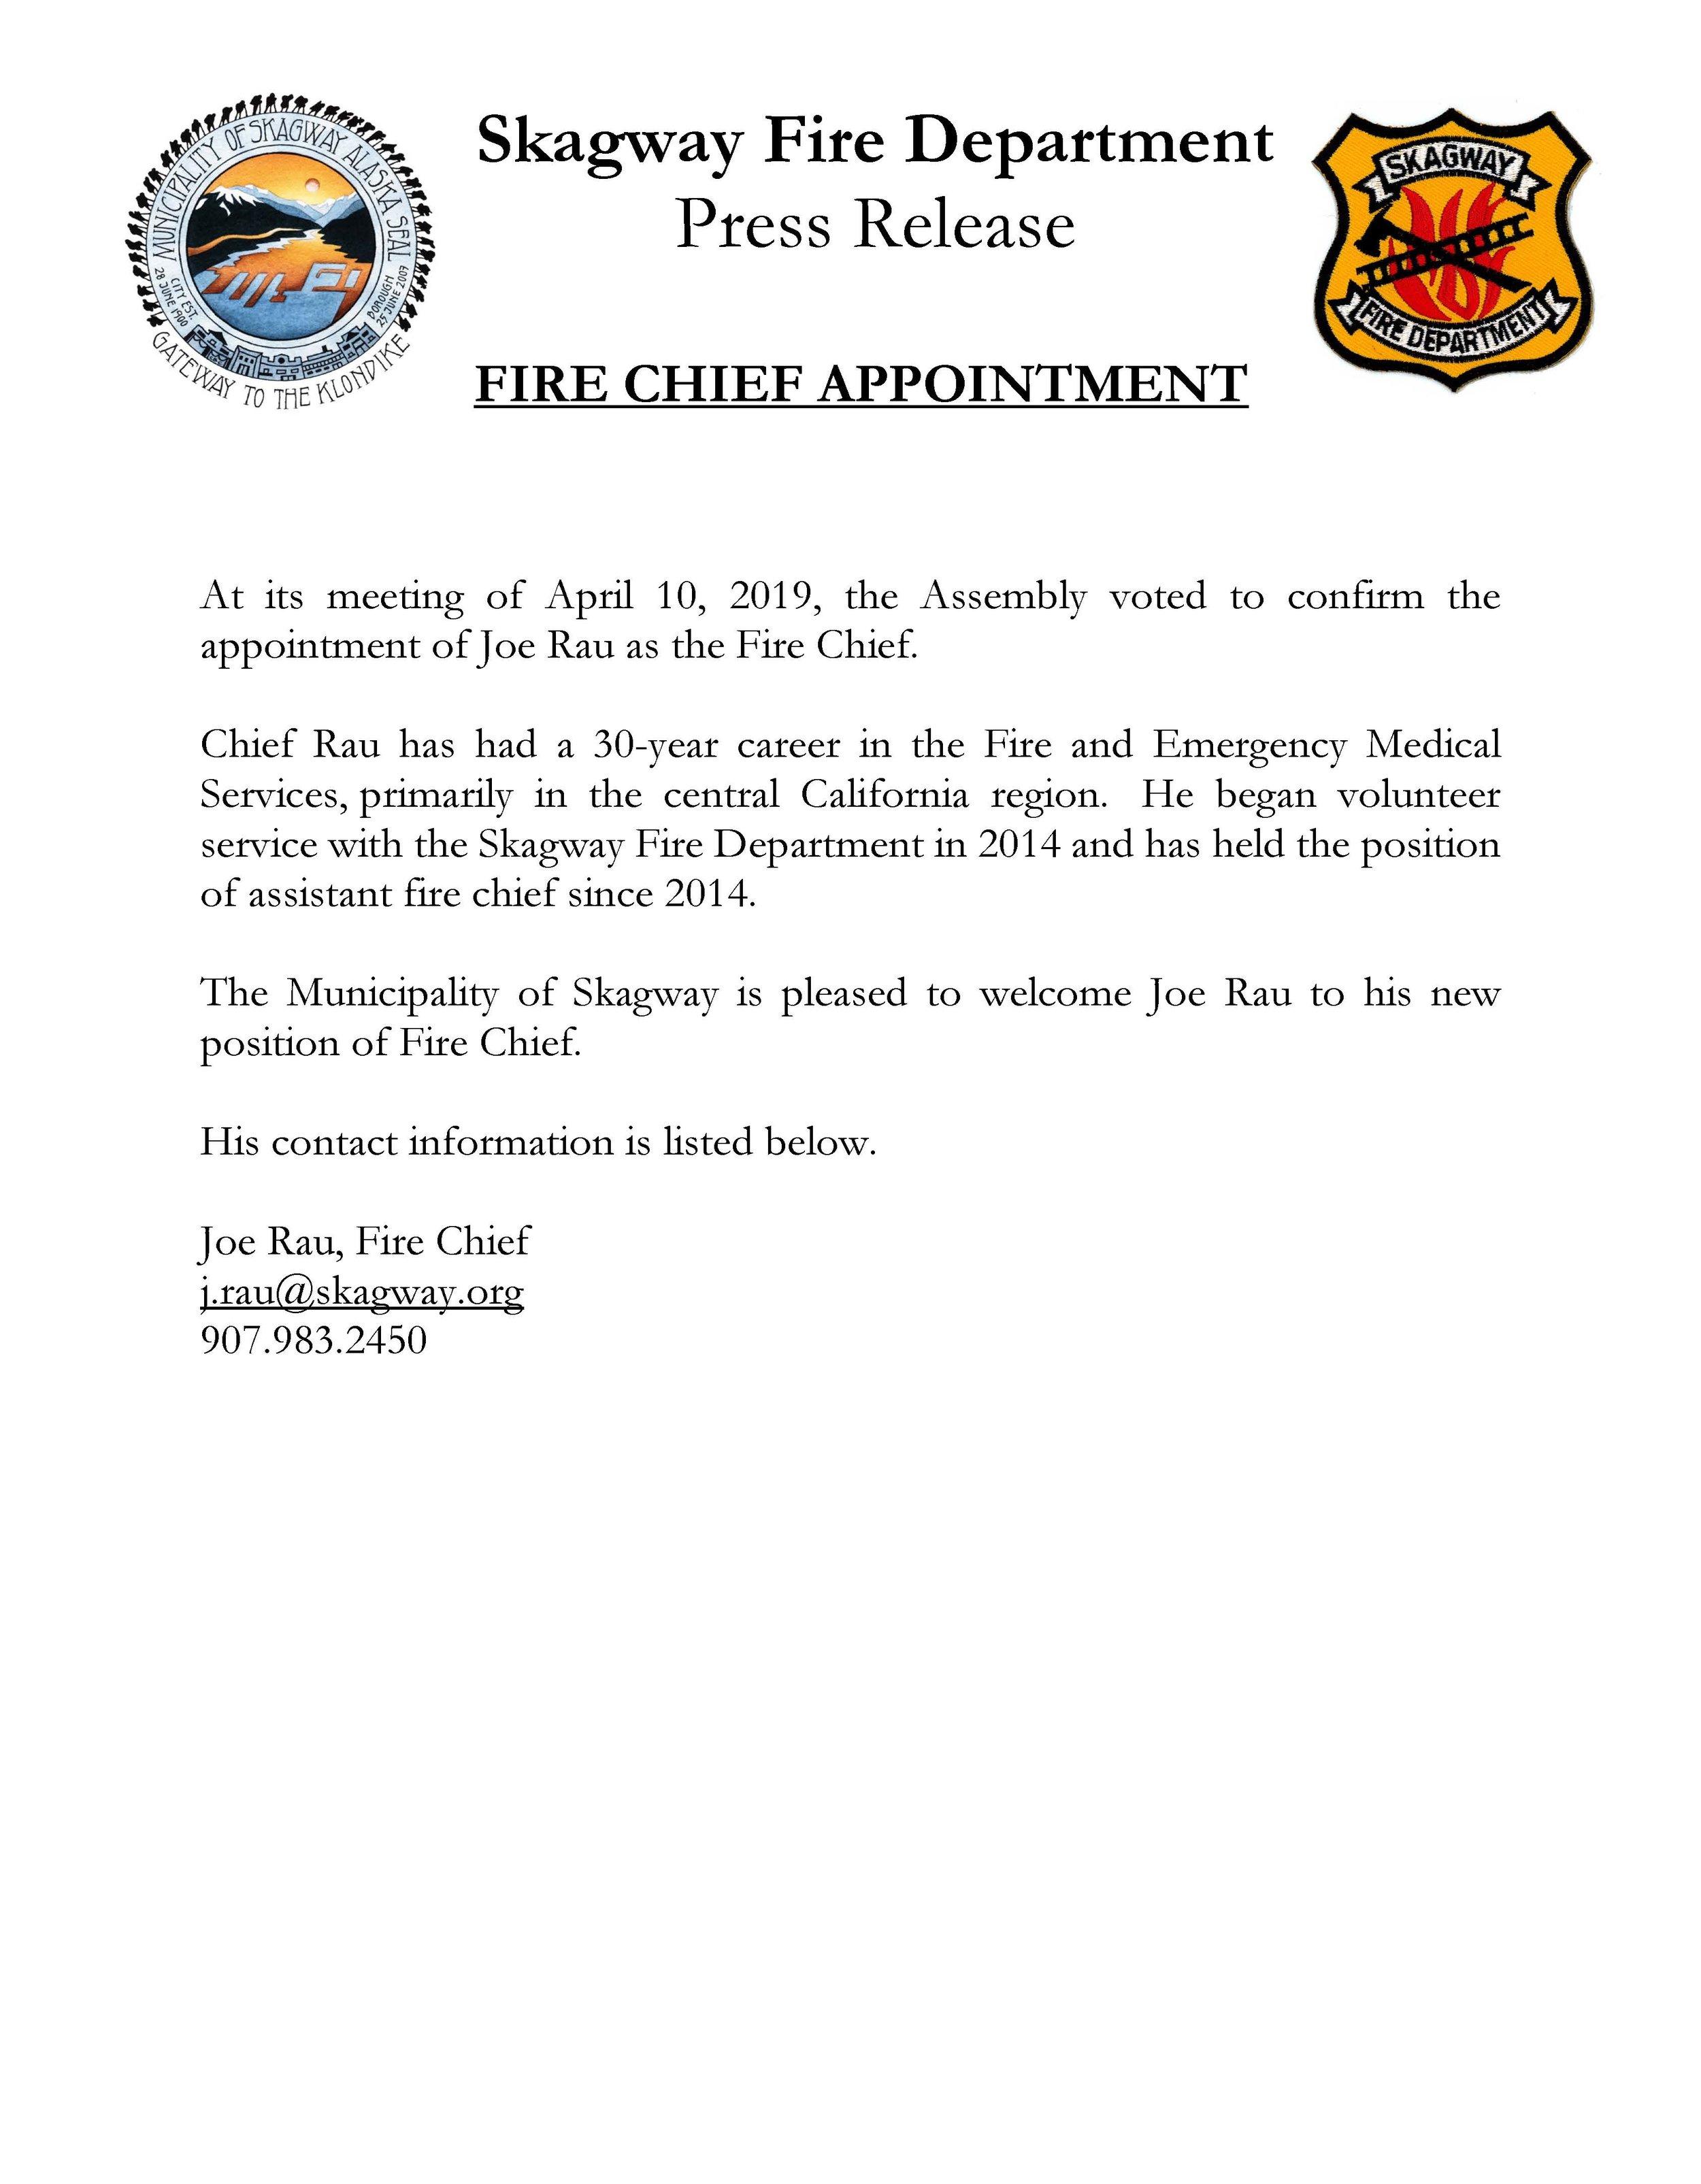 Chief Rau Press Release.jpg